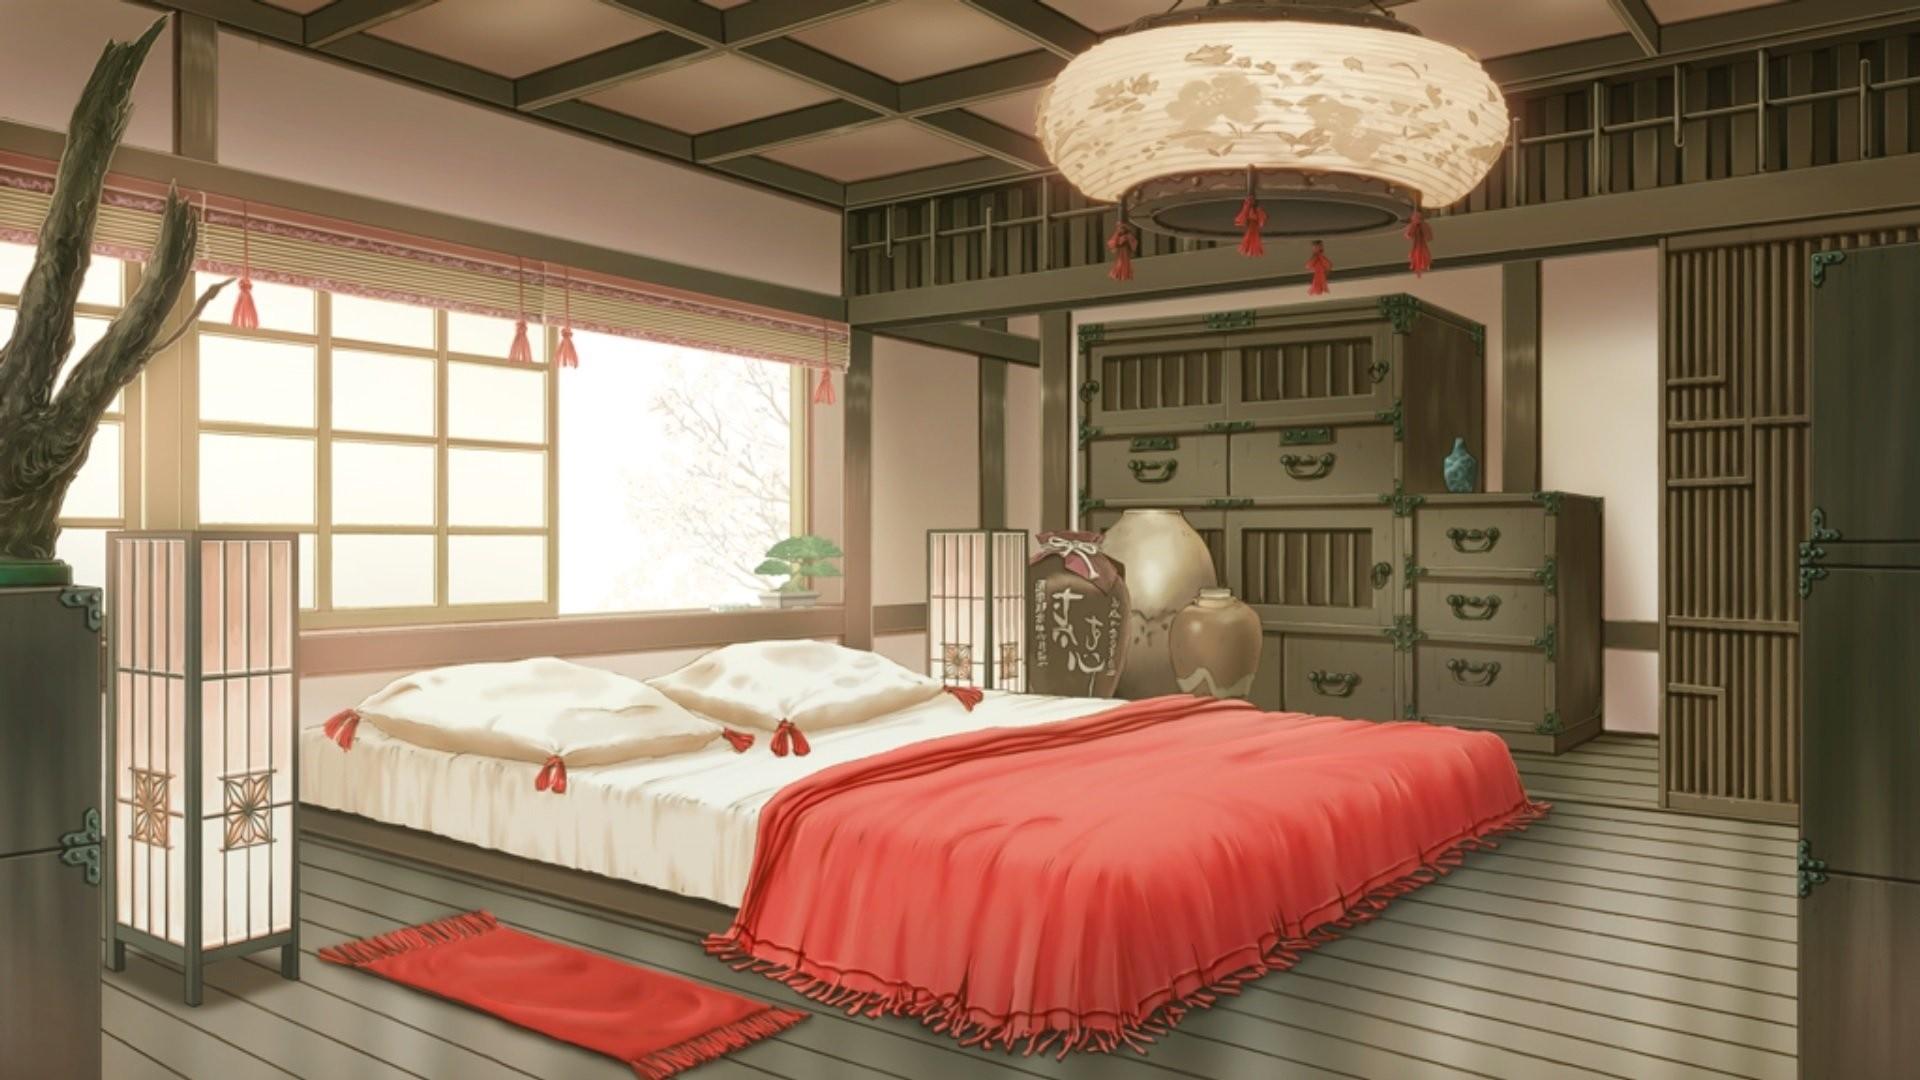 Anime Bedroom PC Wallpaper